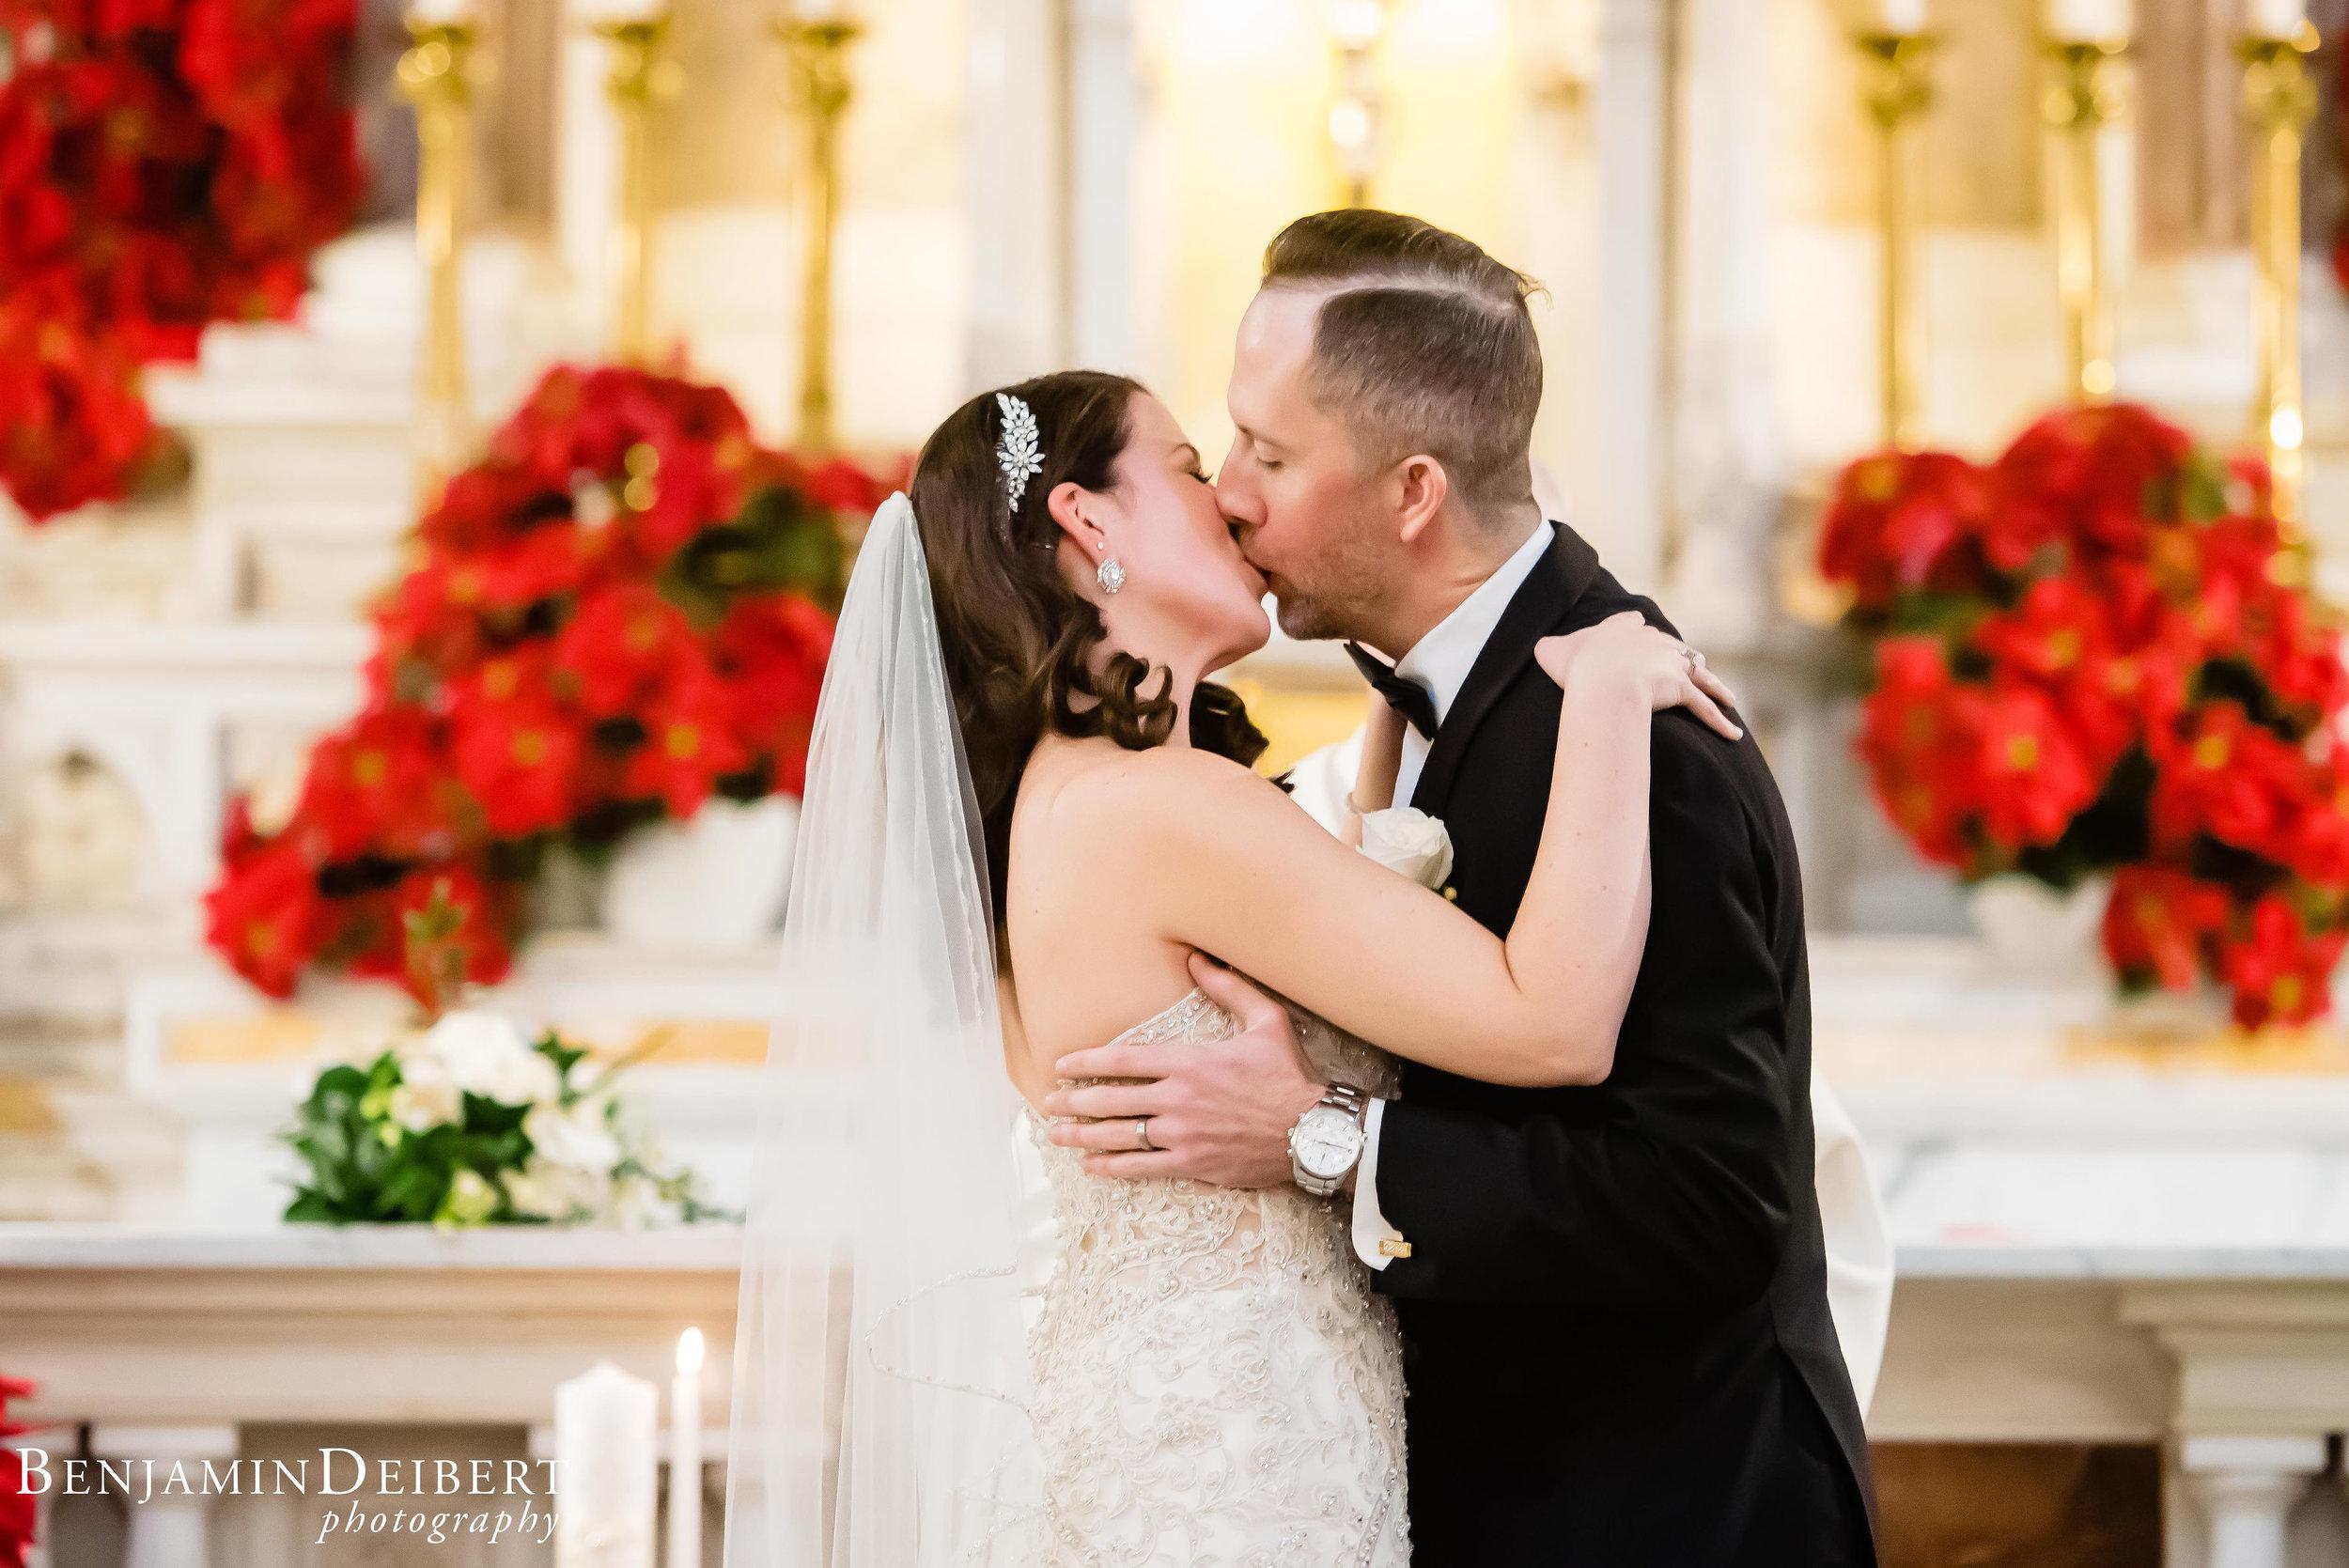 AlexandraandNicholas_RitzCarltonPhiladelphia_Wedding-38.jpg